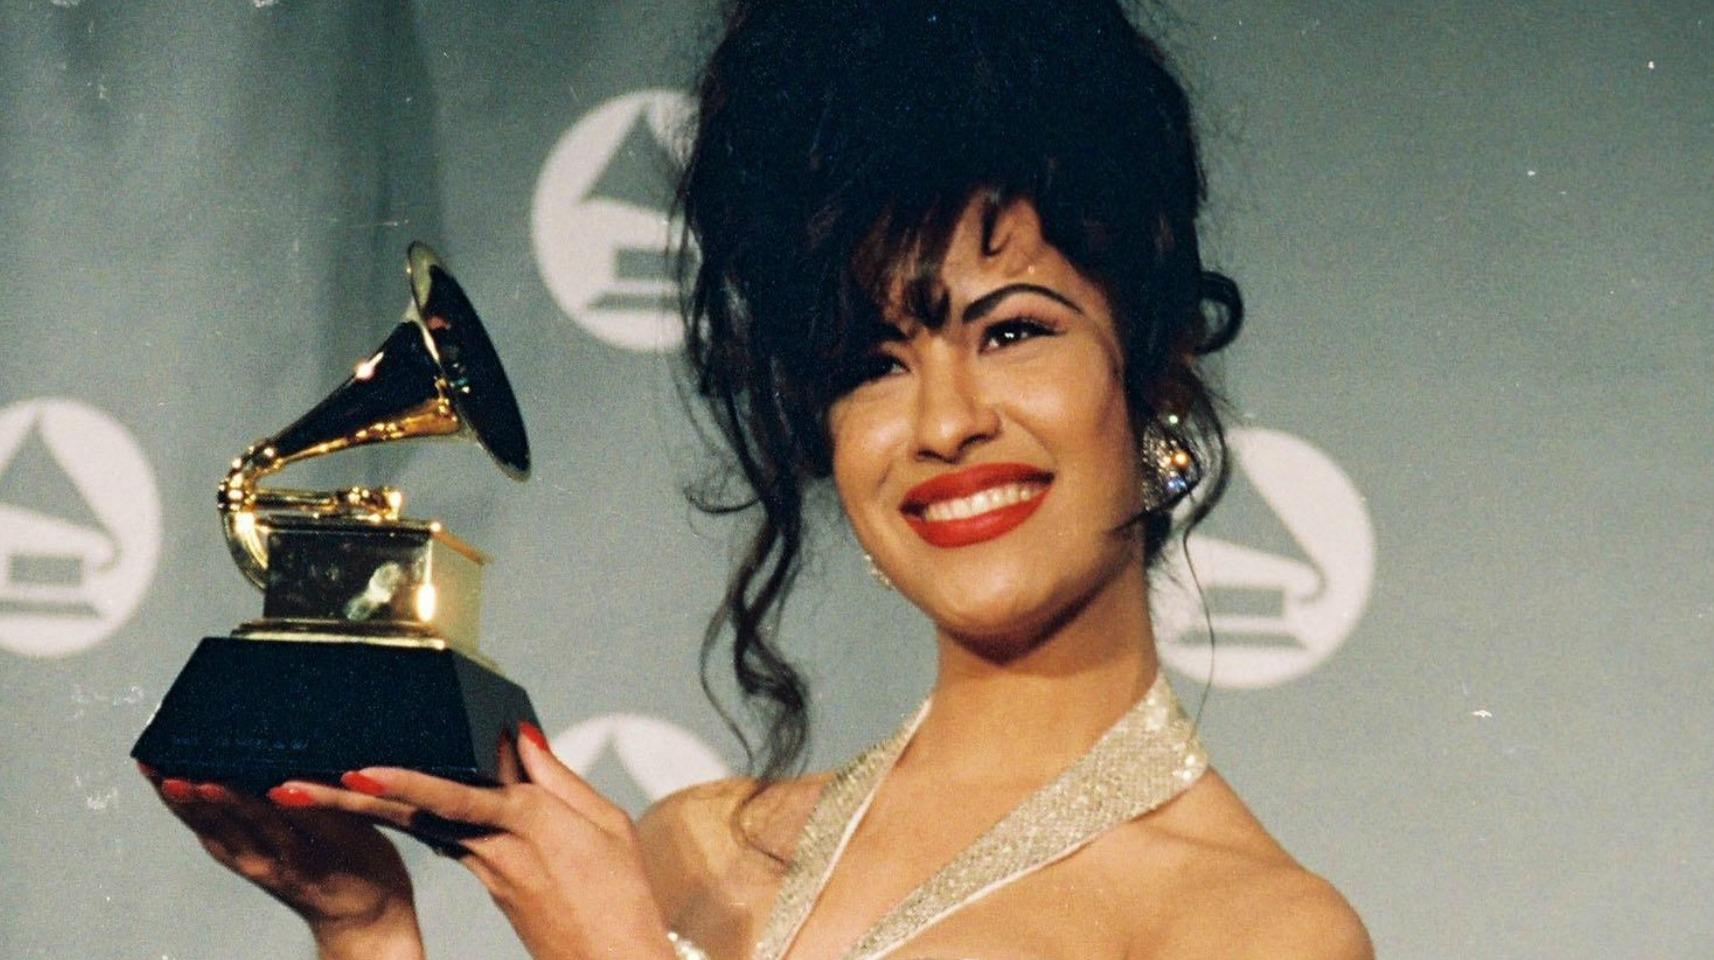 Selena - Bidi Bidi Awesome.